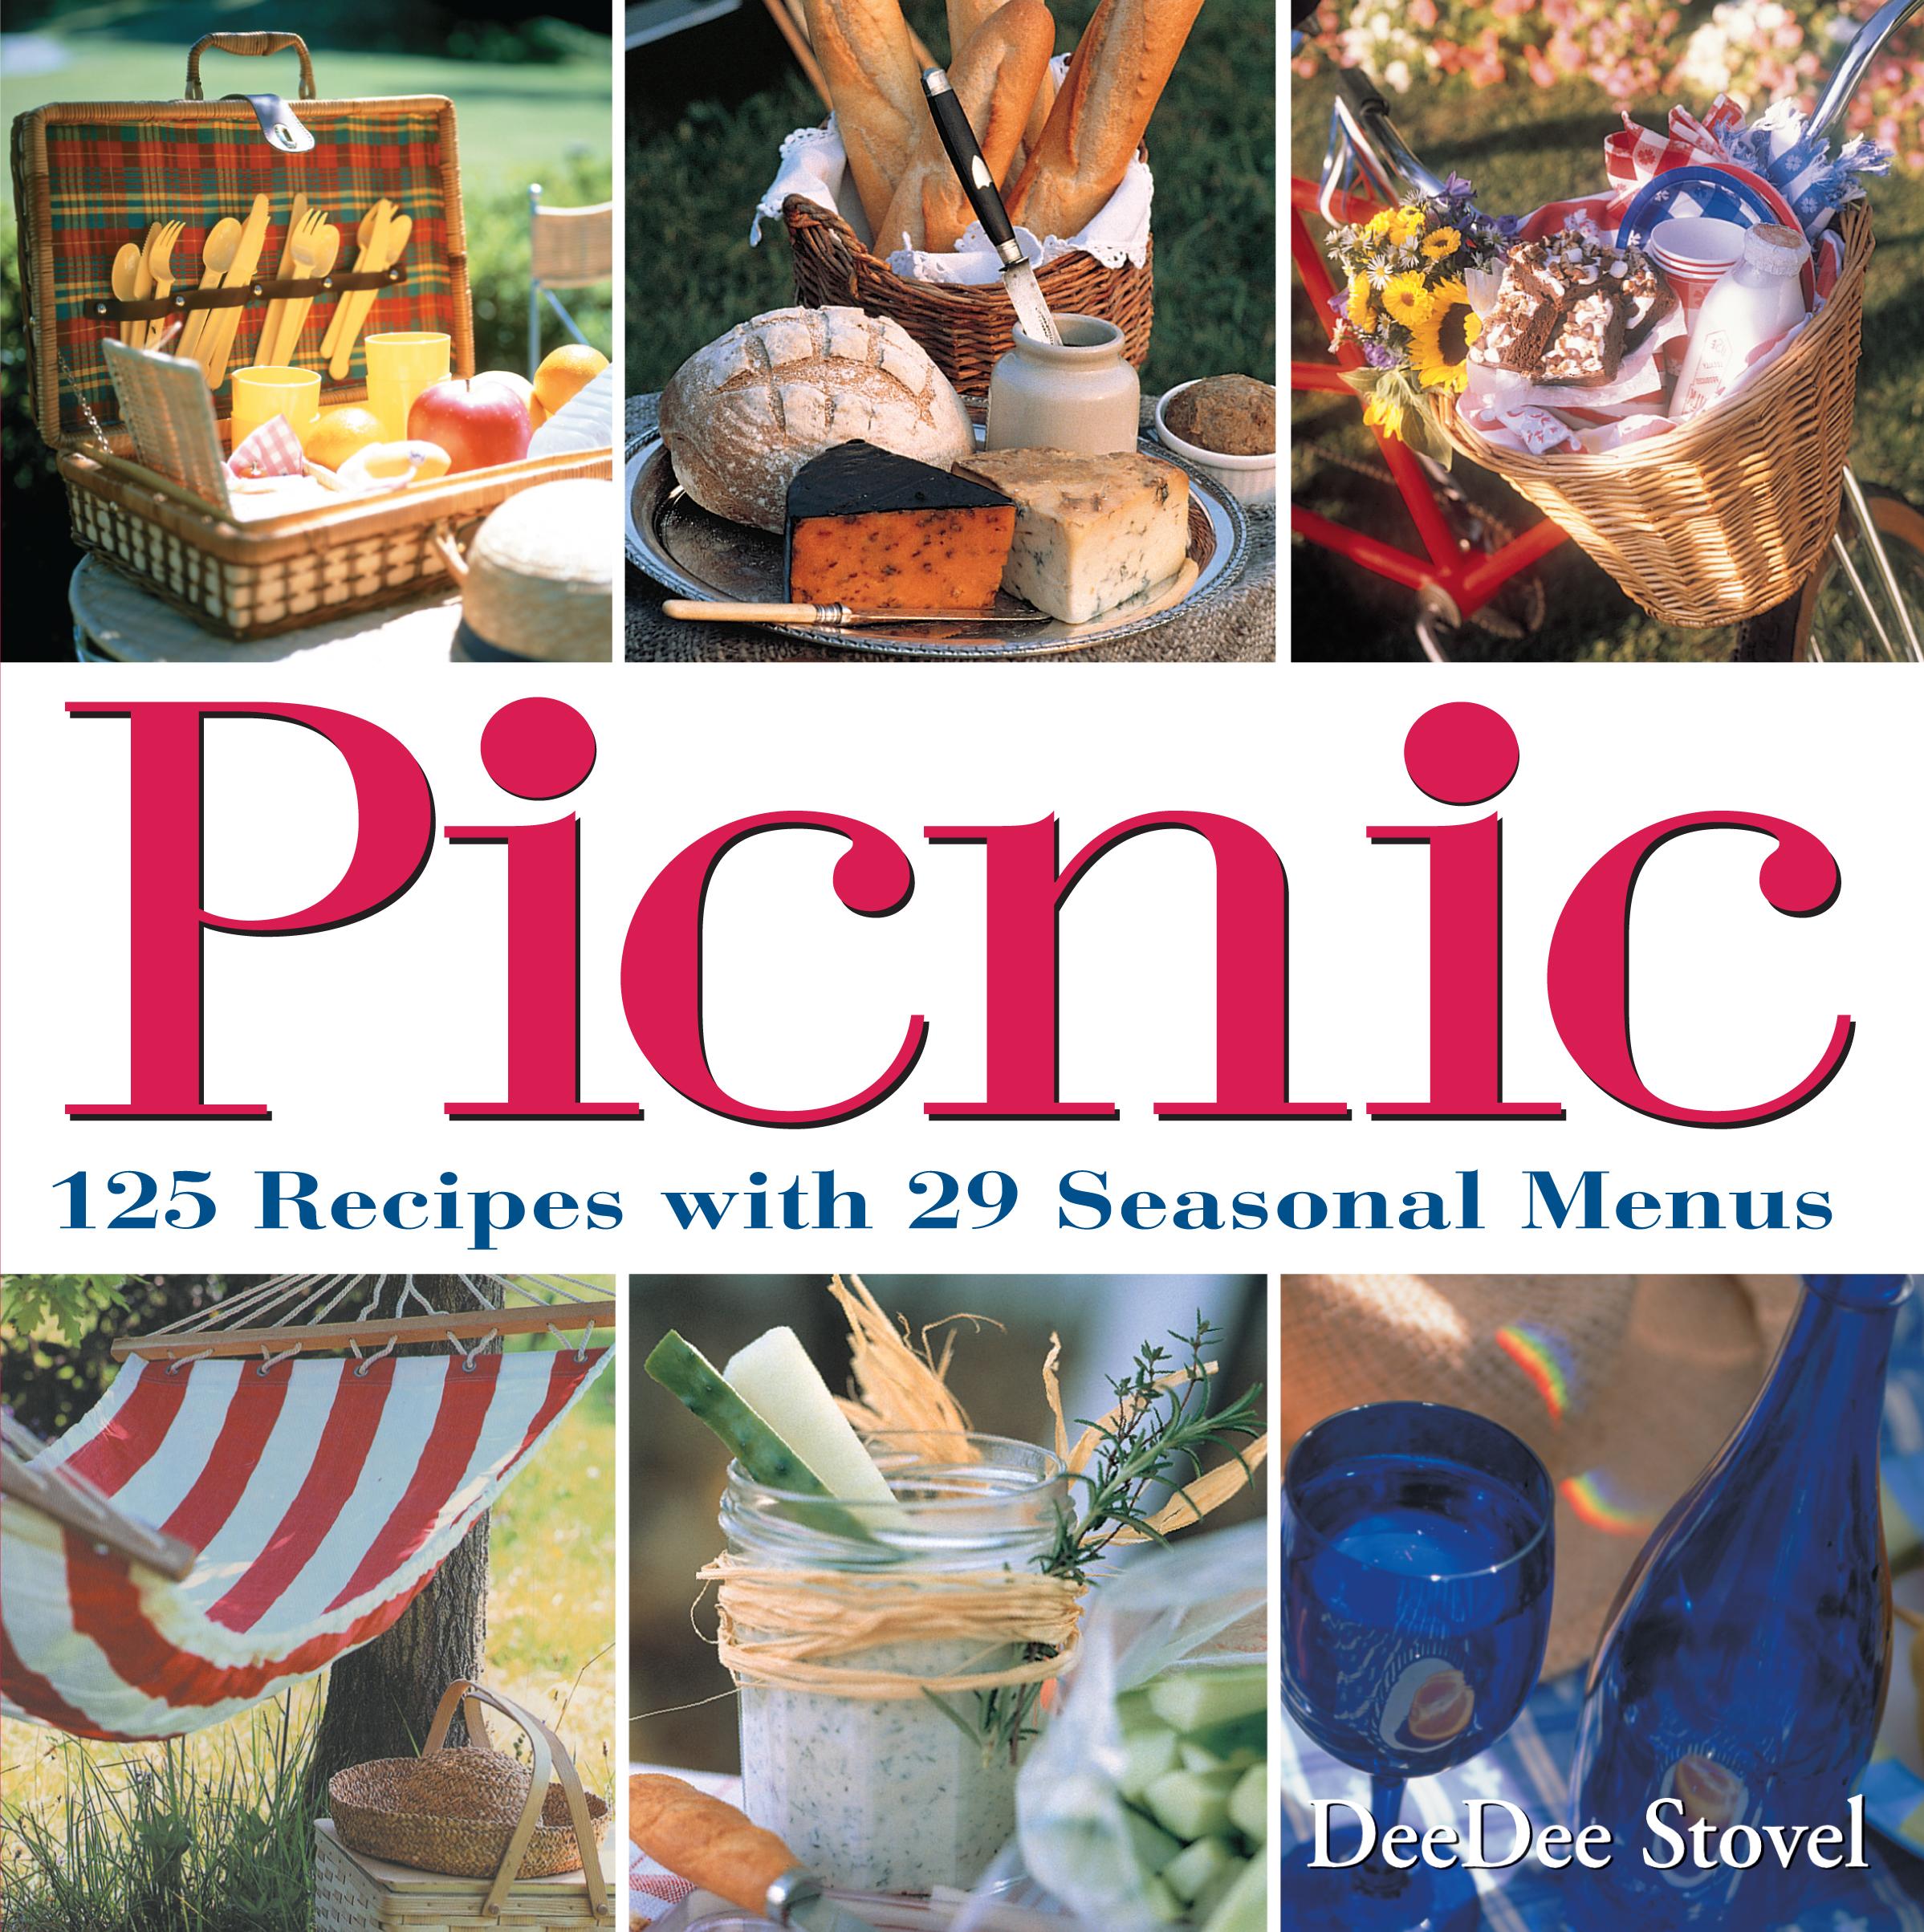 Picnic 125 Recipes with 29 Seasonal Menus - DeeDee Stovel